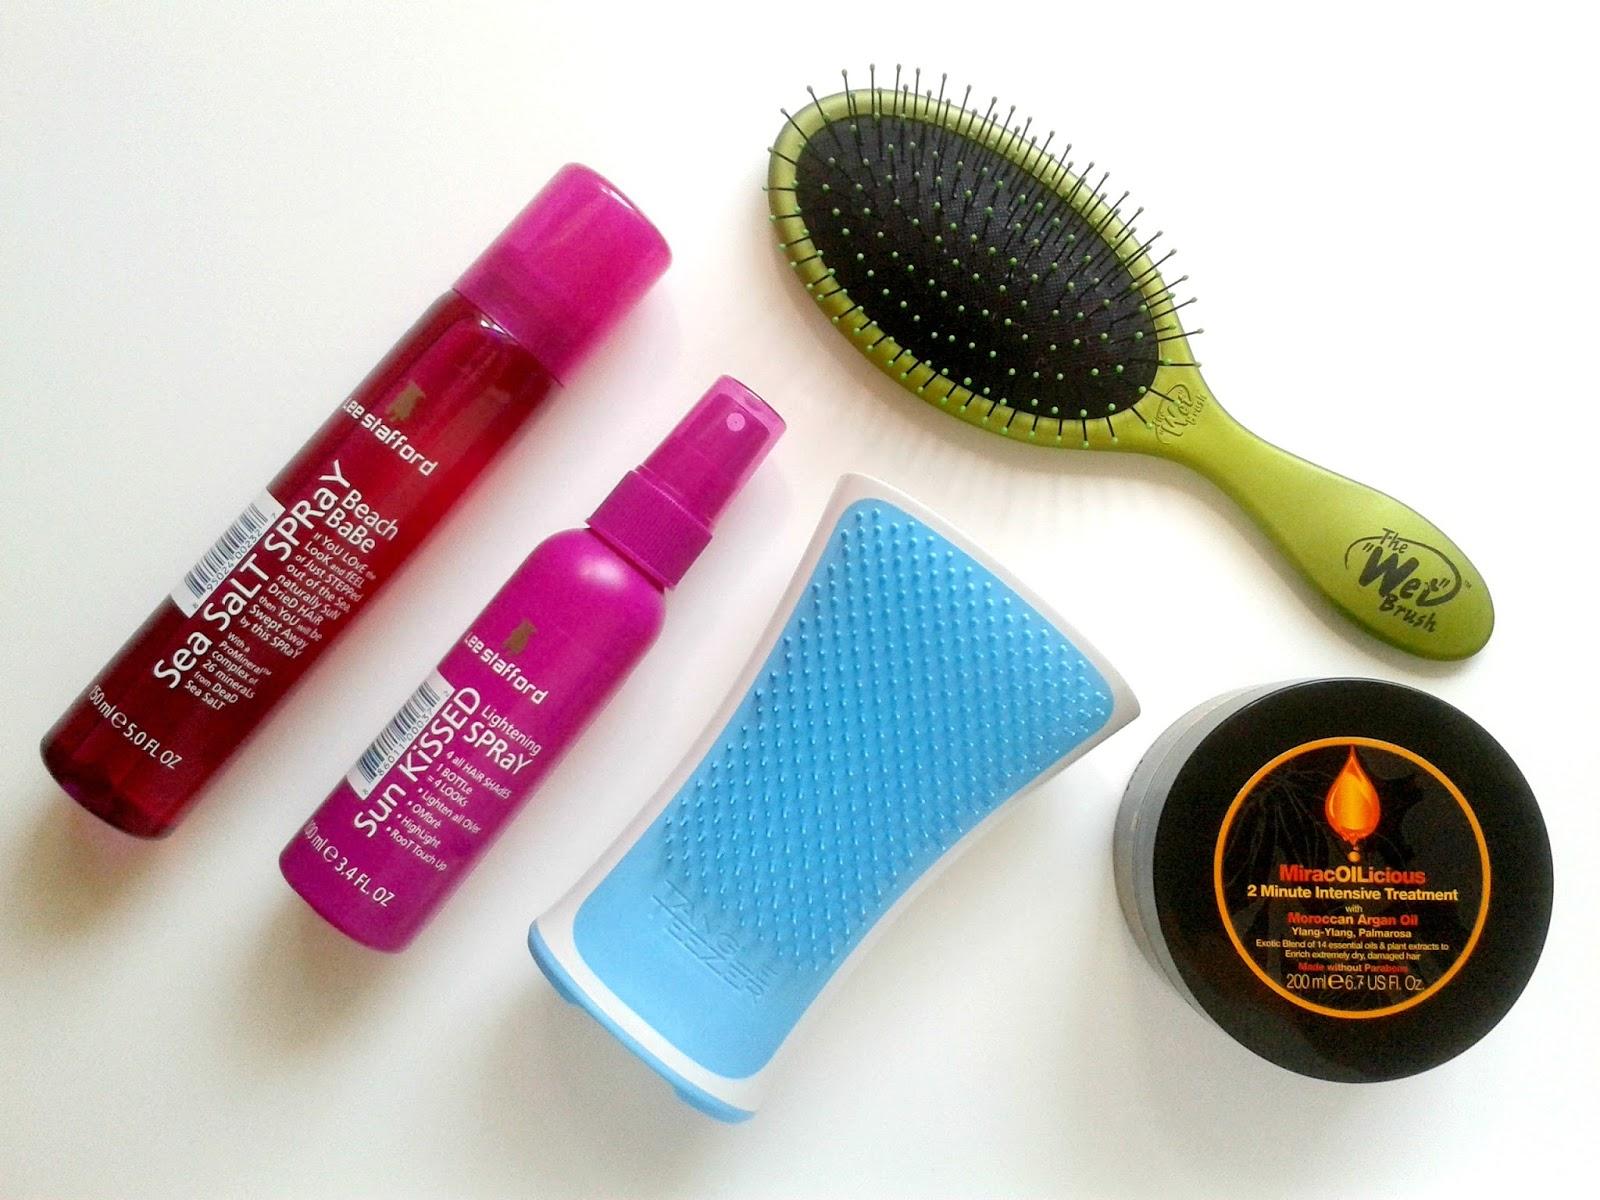 Ellis Tuesday's Summer Sun-Days: Hair Beauty Review The Wet Brush Tangle Teezer Aqua Splash Lee Stafford Mark Hill